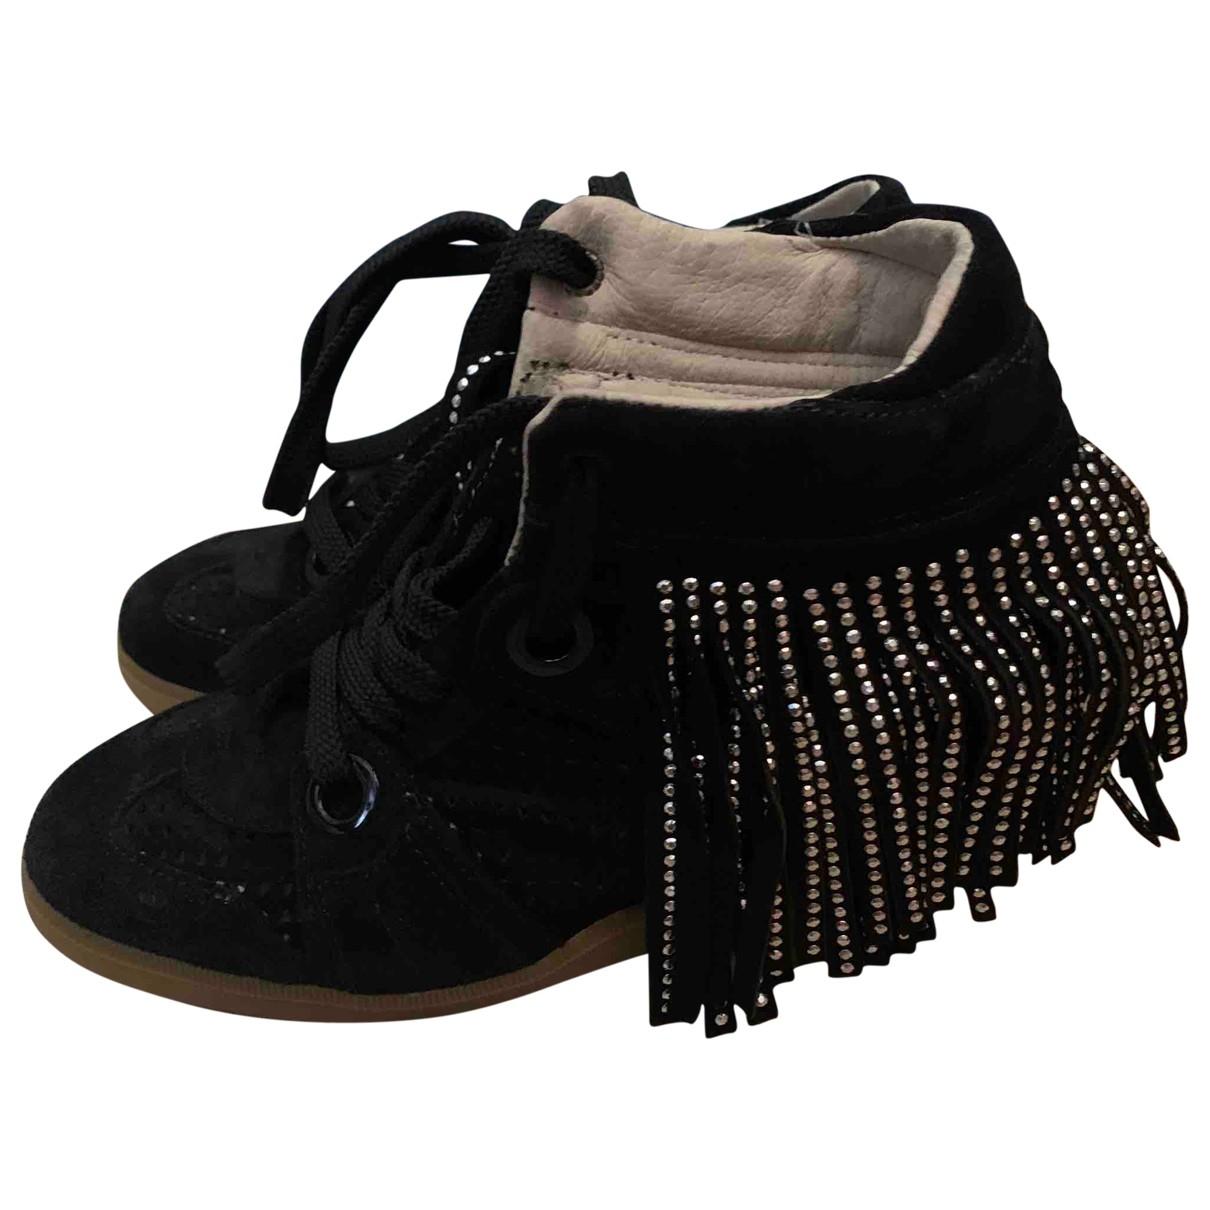 Serafini - Baskets Manhattan pour femme en cuir - noir